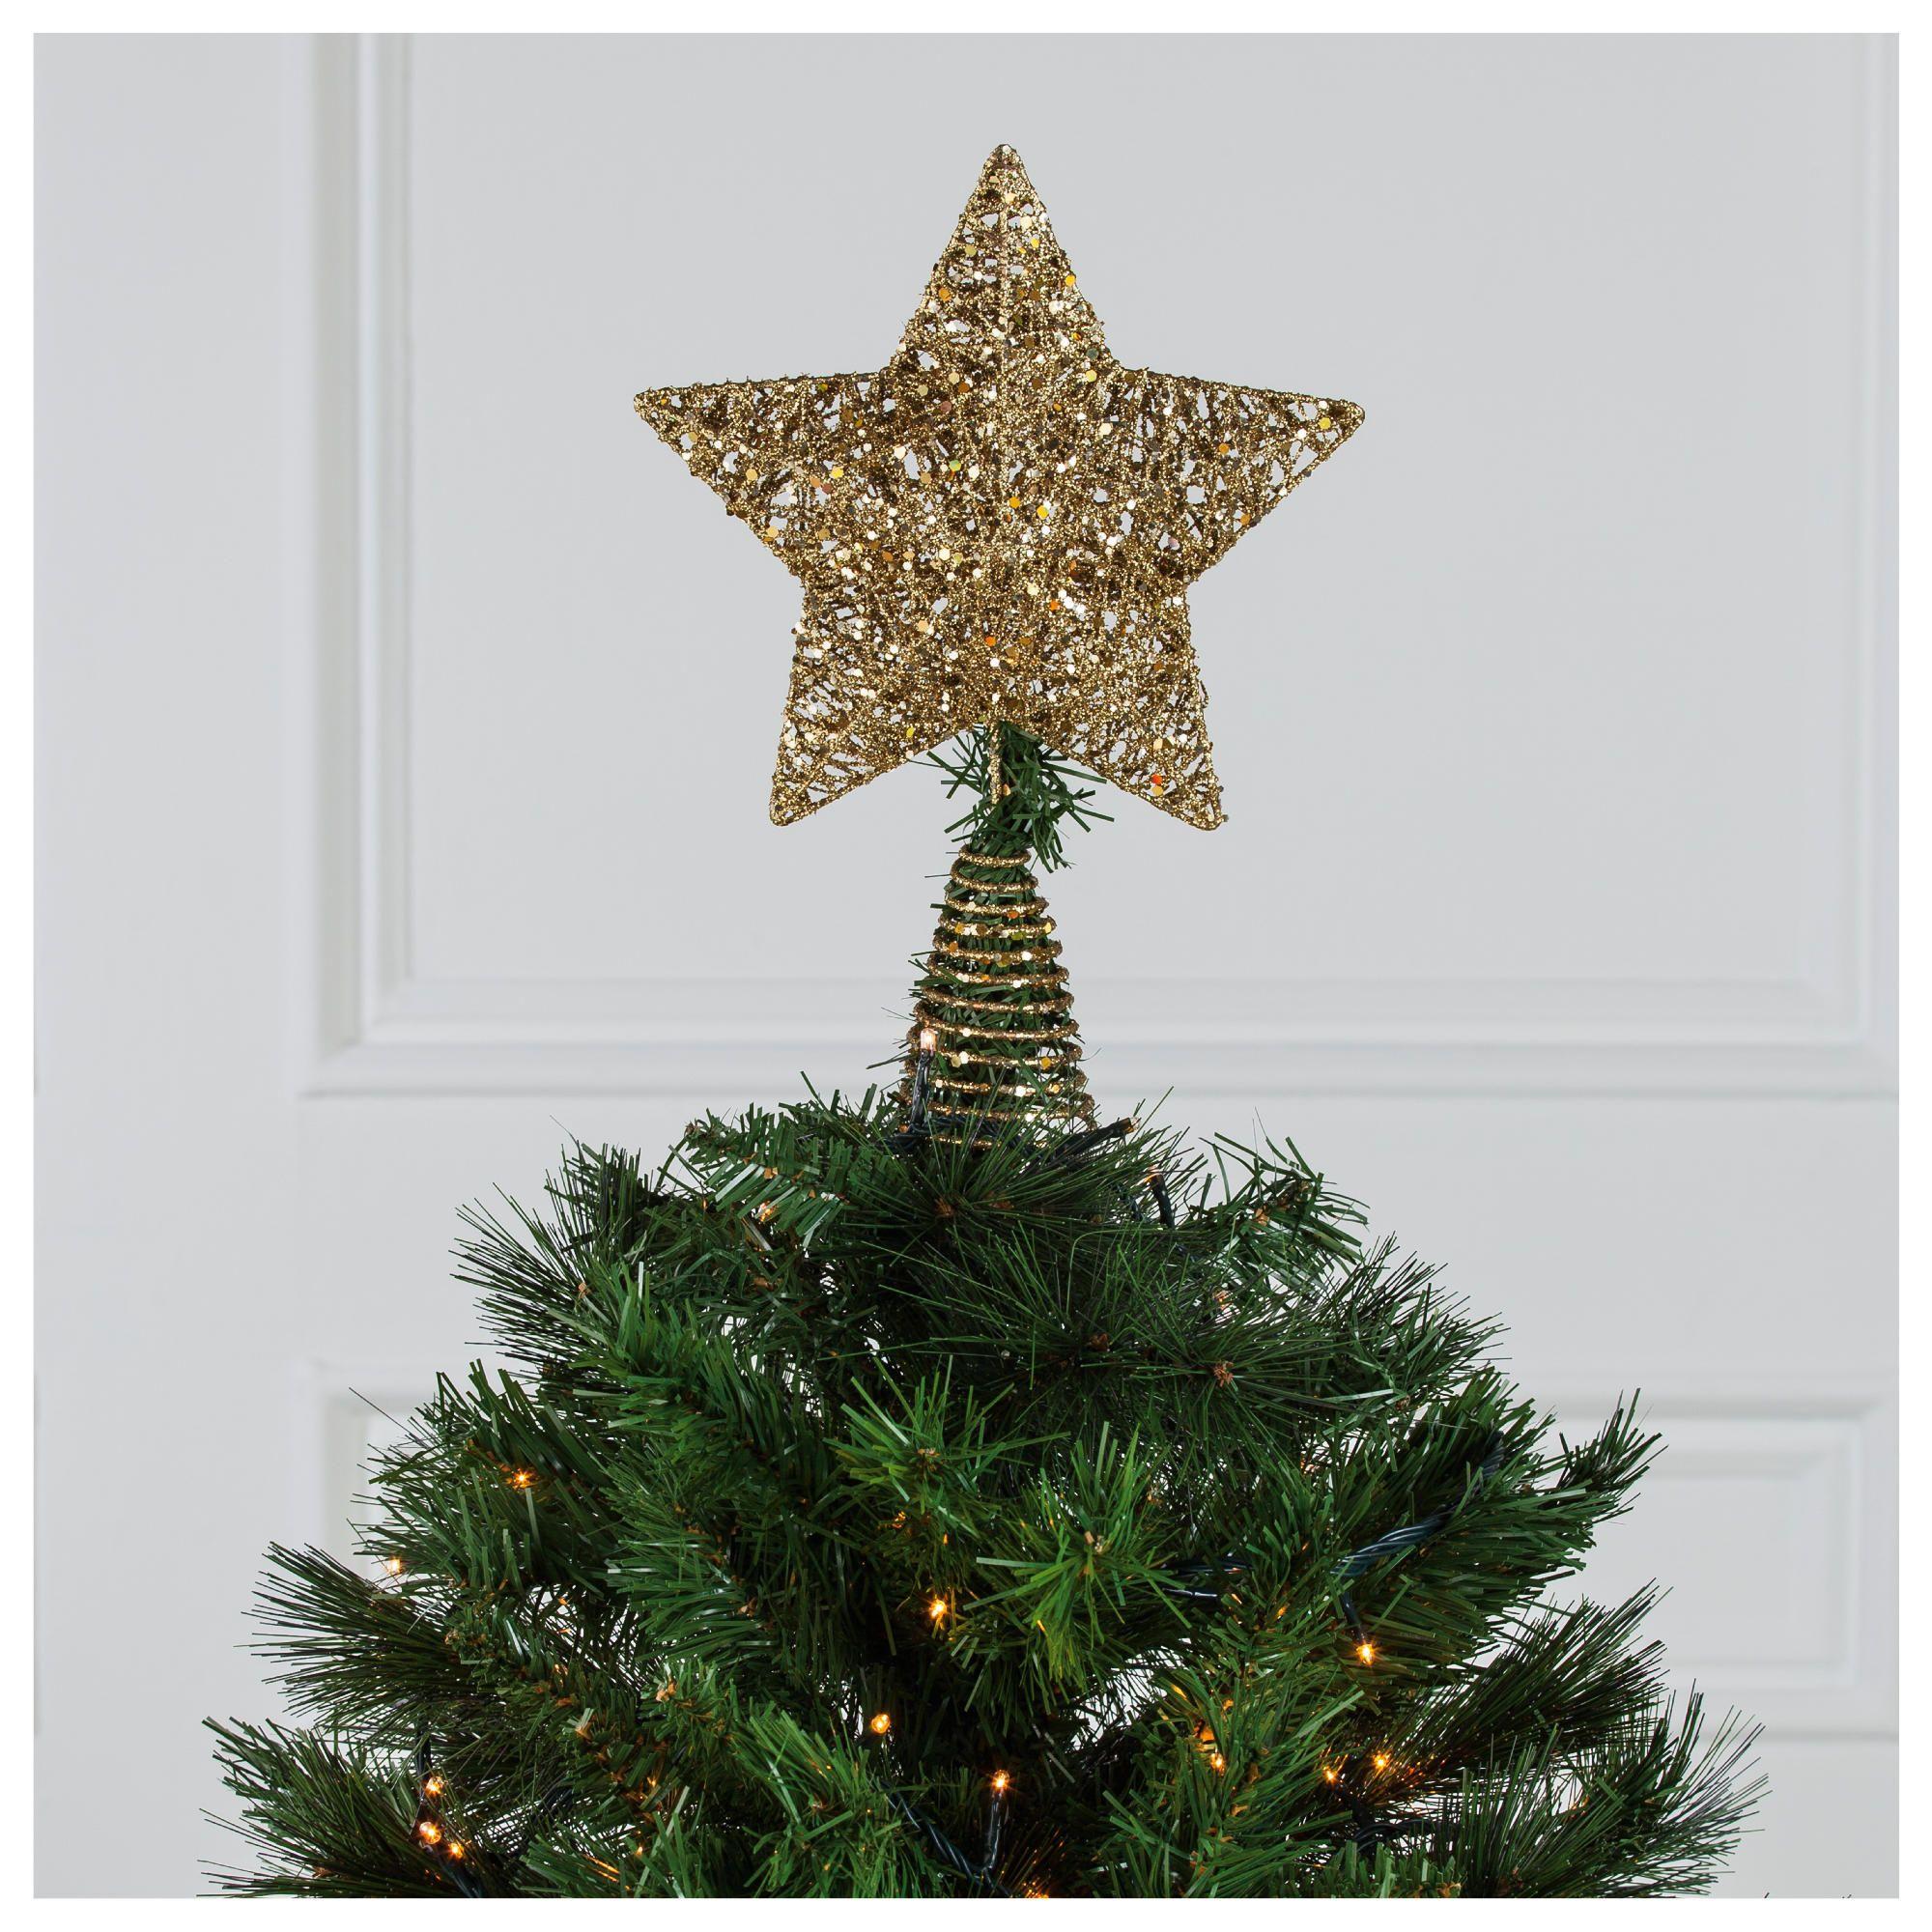 Plastic Christmas Cake Decorations Tesco : Christmas Tree Hooks Tesco: Martin brookes oakham rutland ...